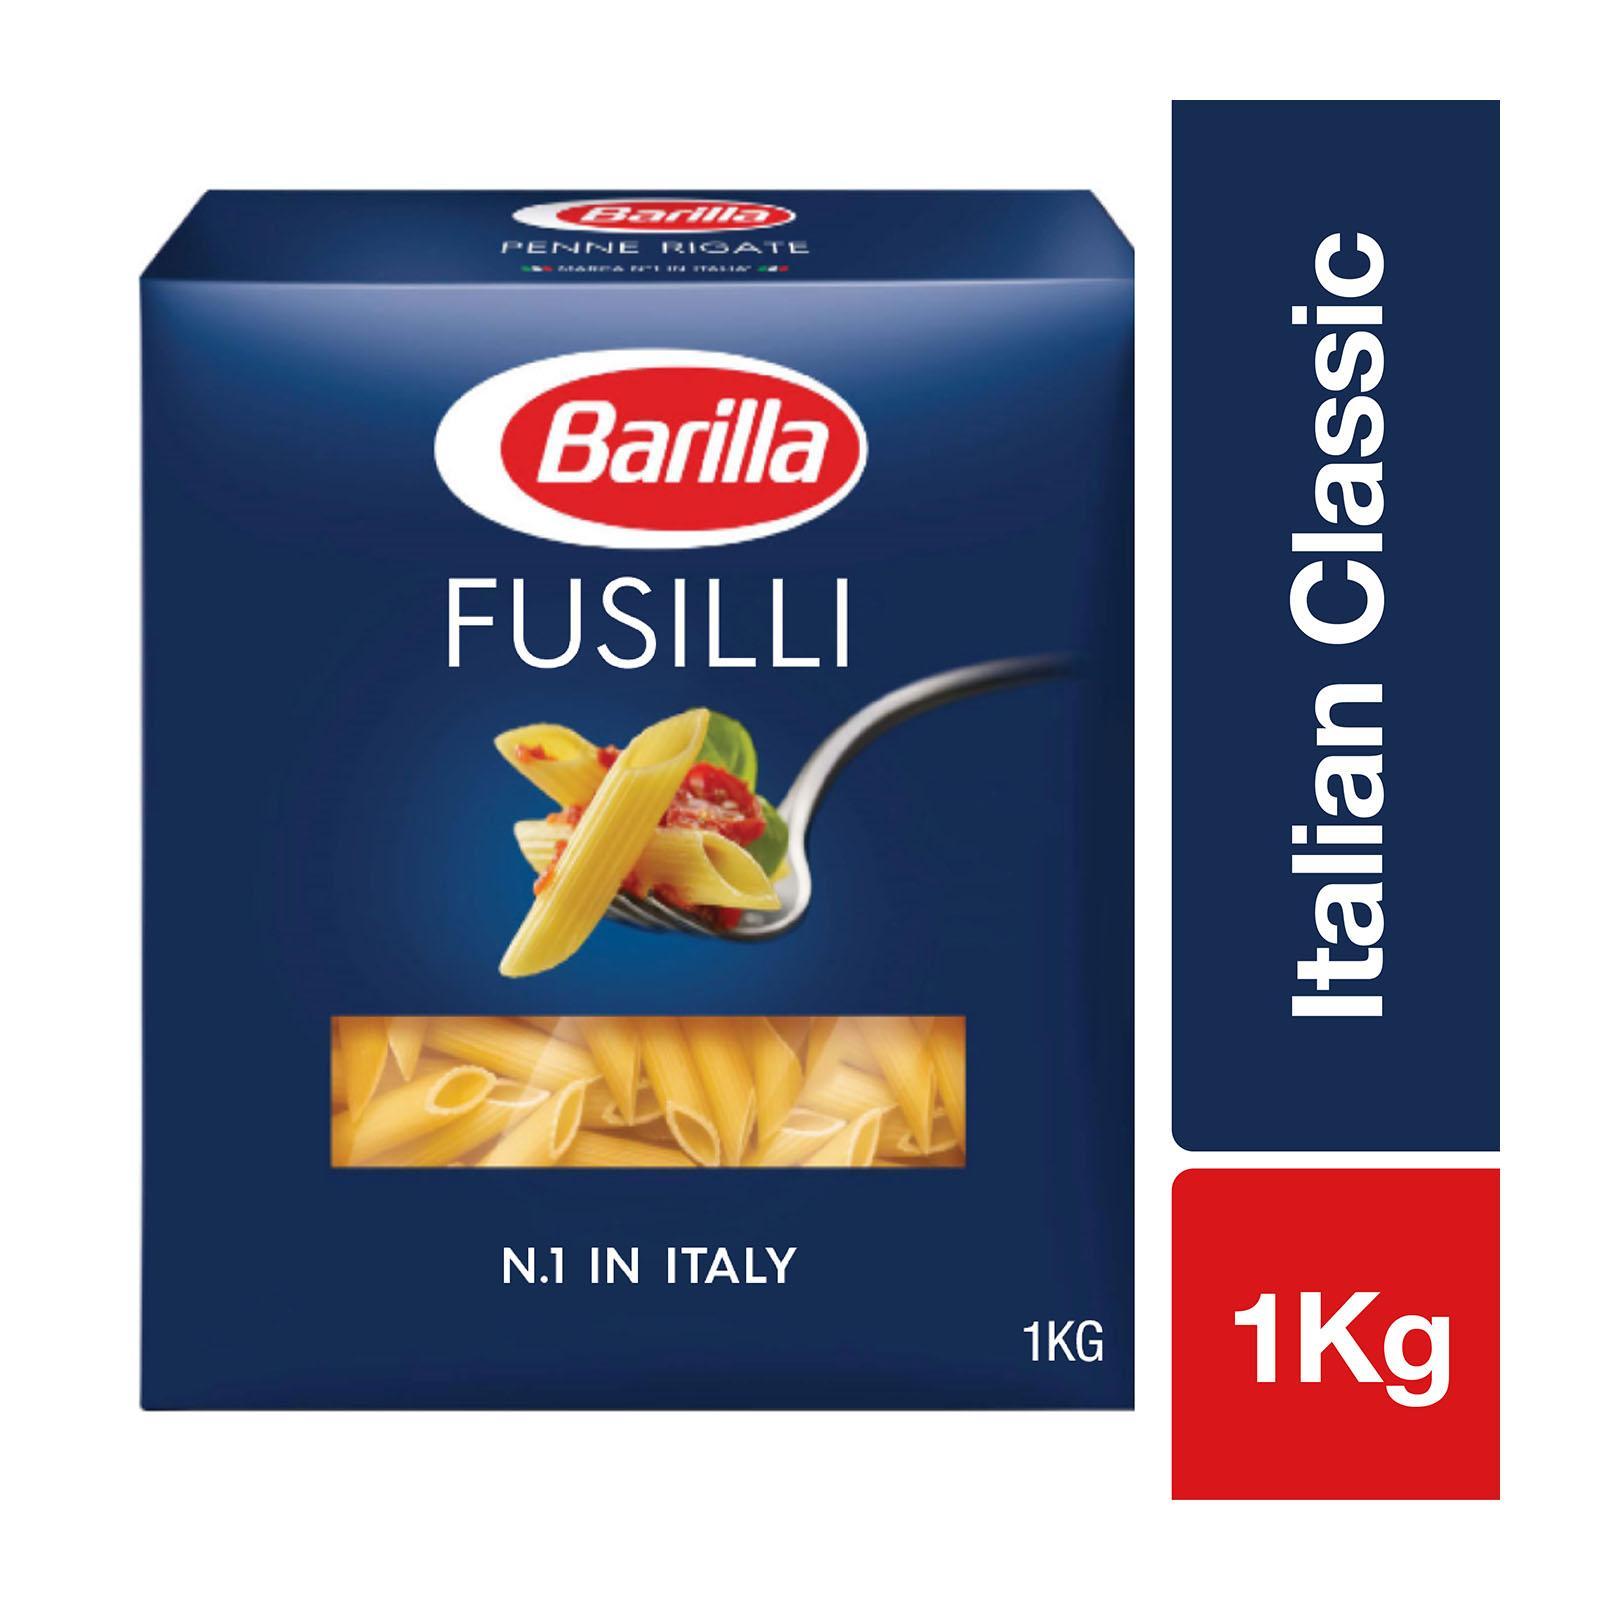 Barilla Fusilli Gluten Free Pasta